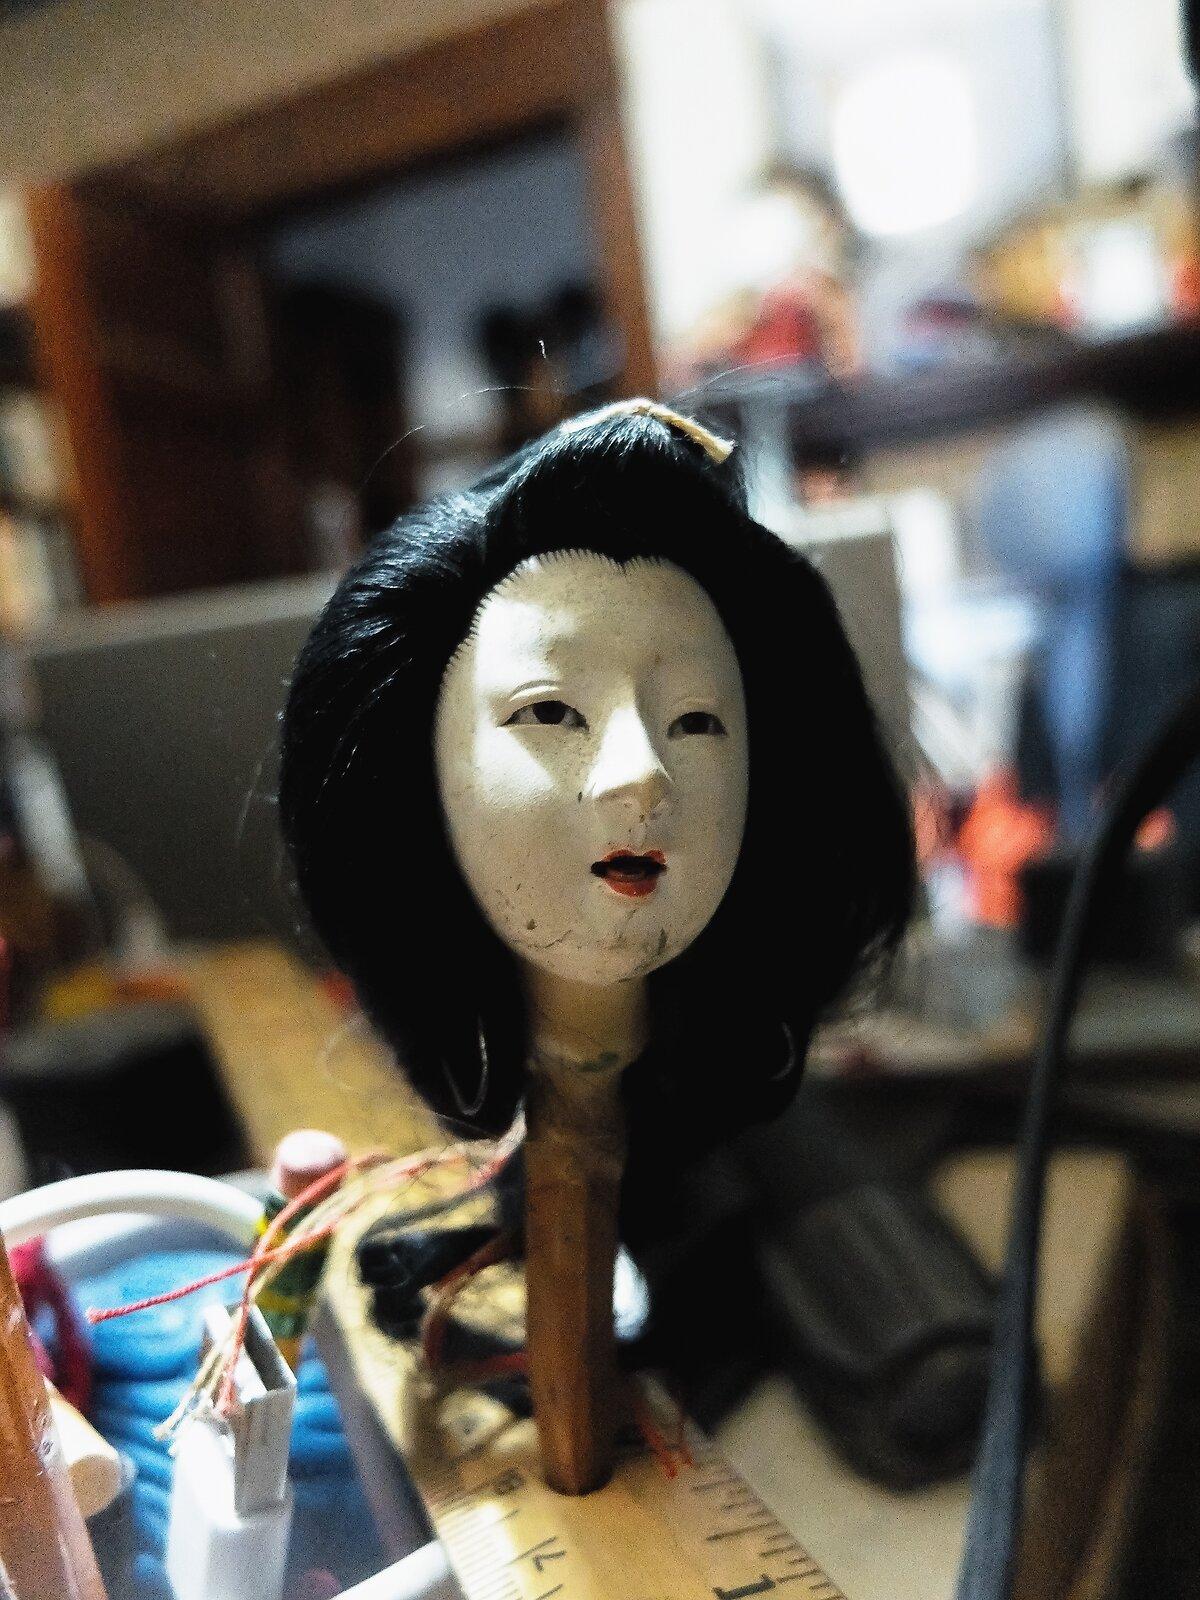 X30_Apr27_21_Japanese_doll's_head.jpg